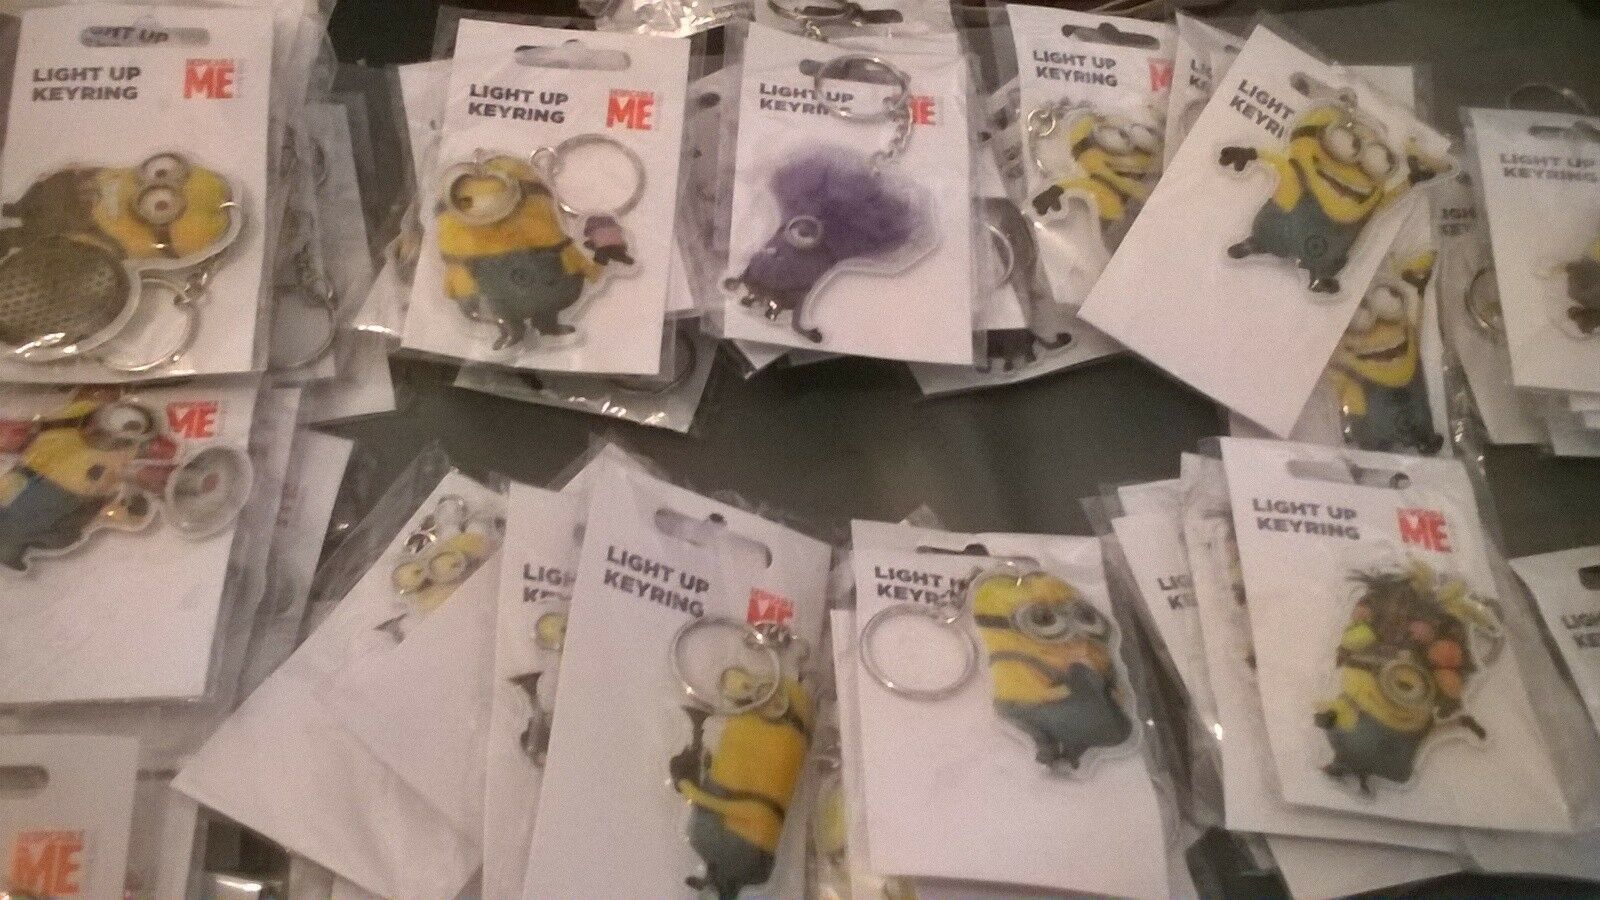 MINION Despicable Me phone bag DS charm light up keyring party bag favour NEW